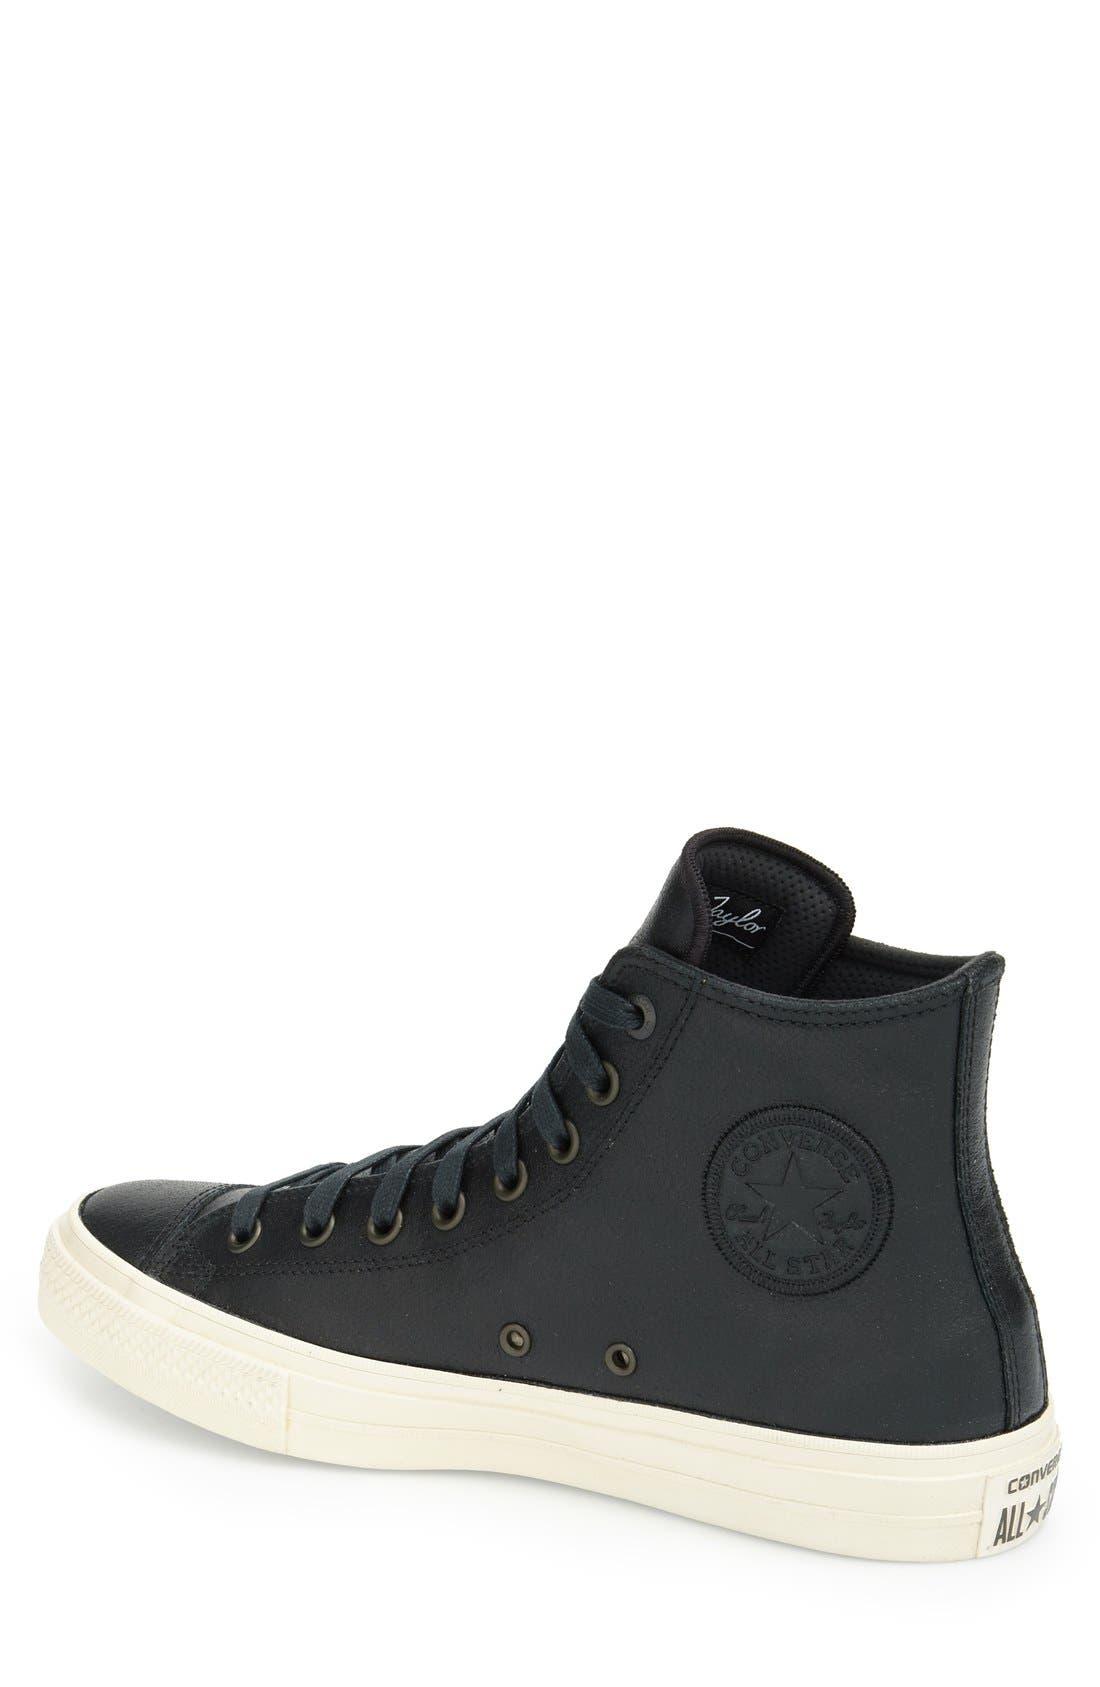 'Chuck II' High Top Sneaker,                             Alternate thumbnail 3, color,                             003